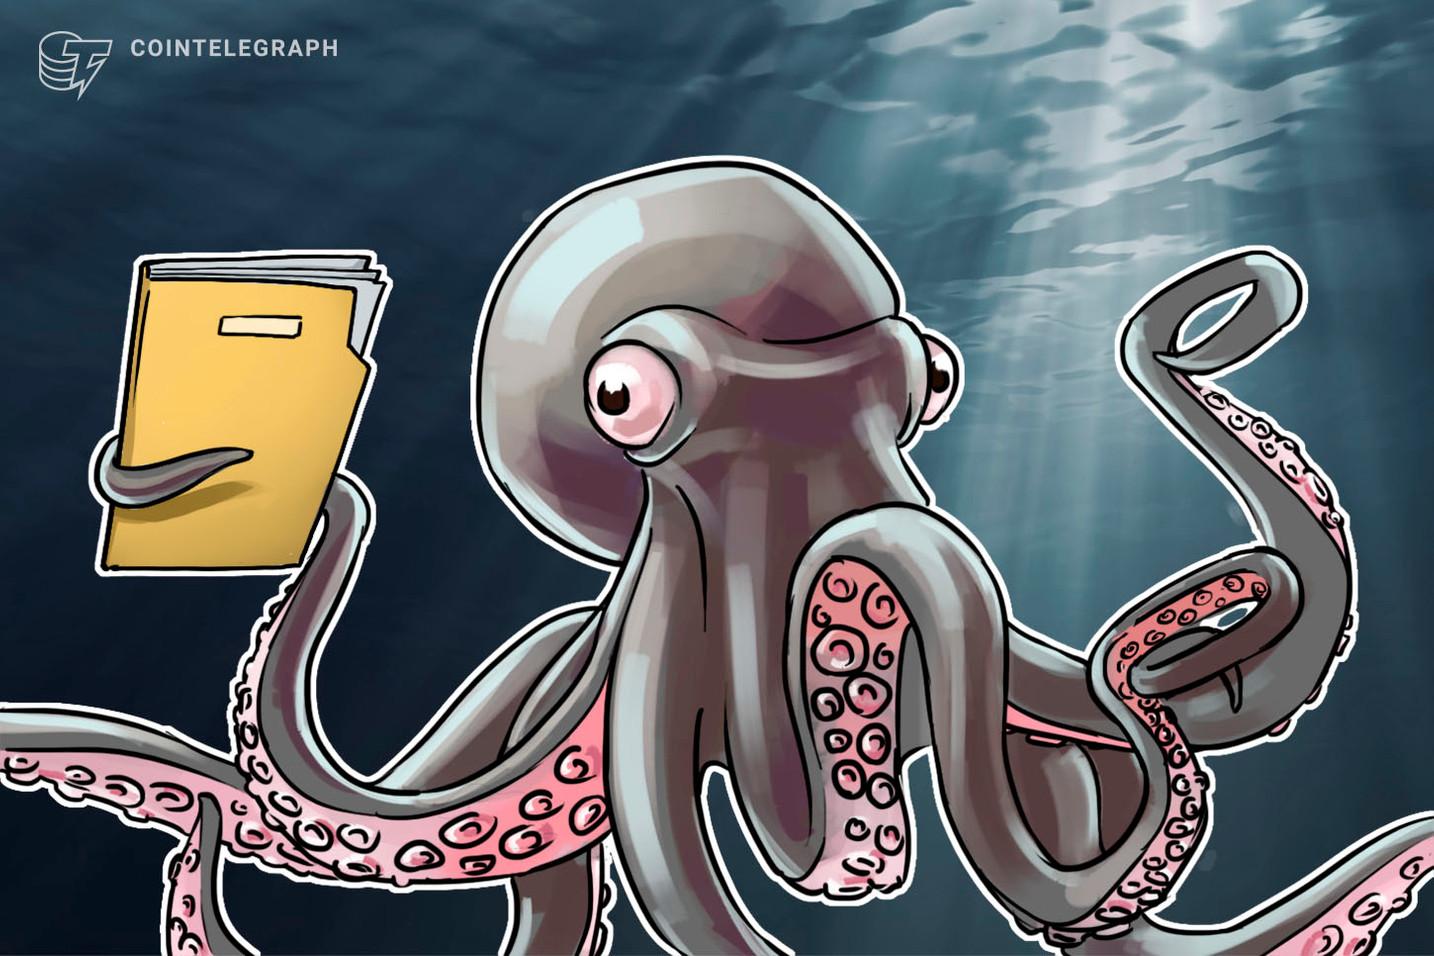 UK Financial Watchdog Retracts Kraken Warning, but BitMEX Caution Stays Up